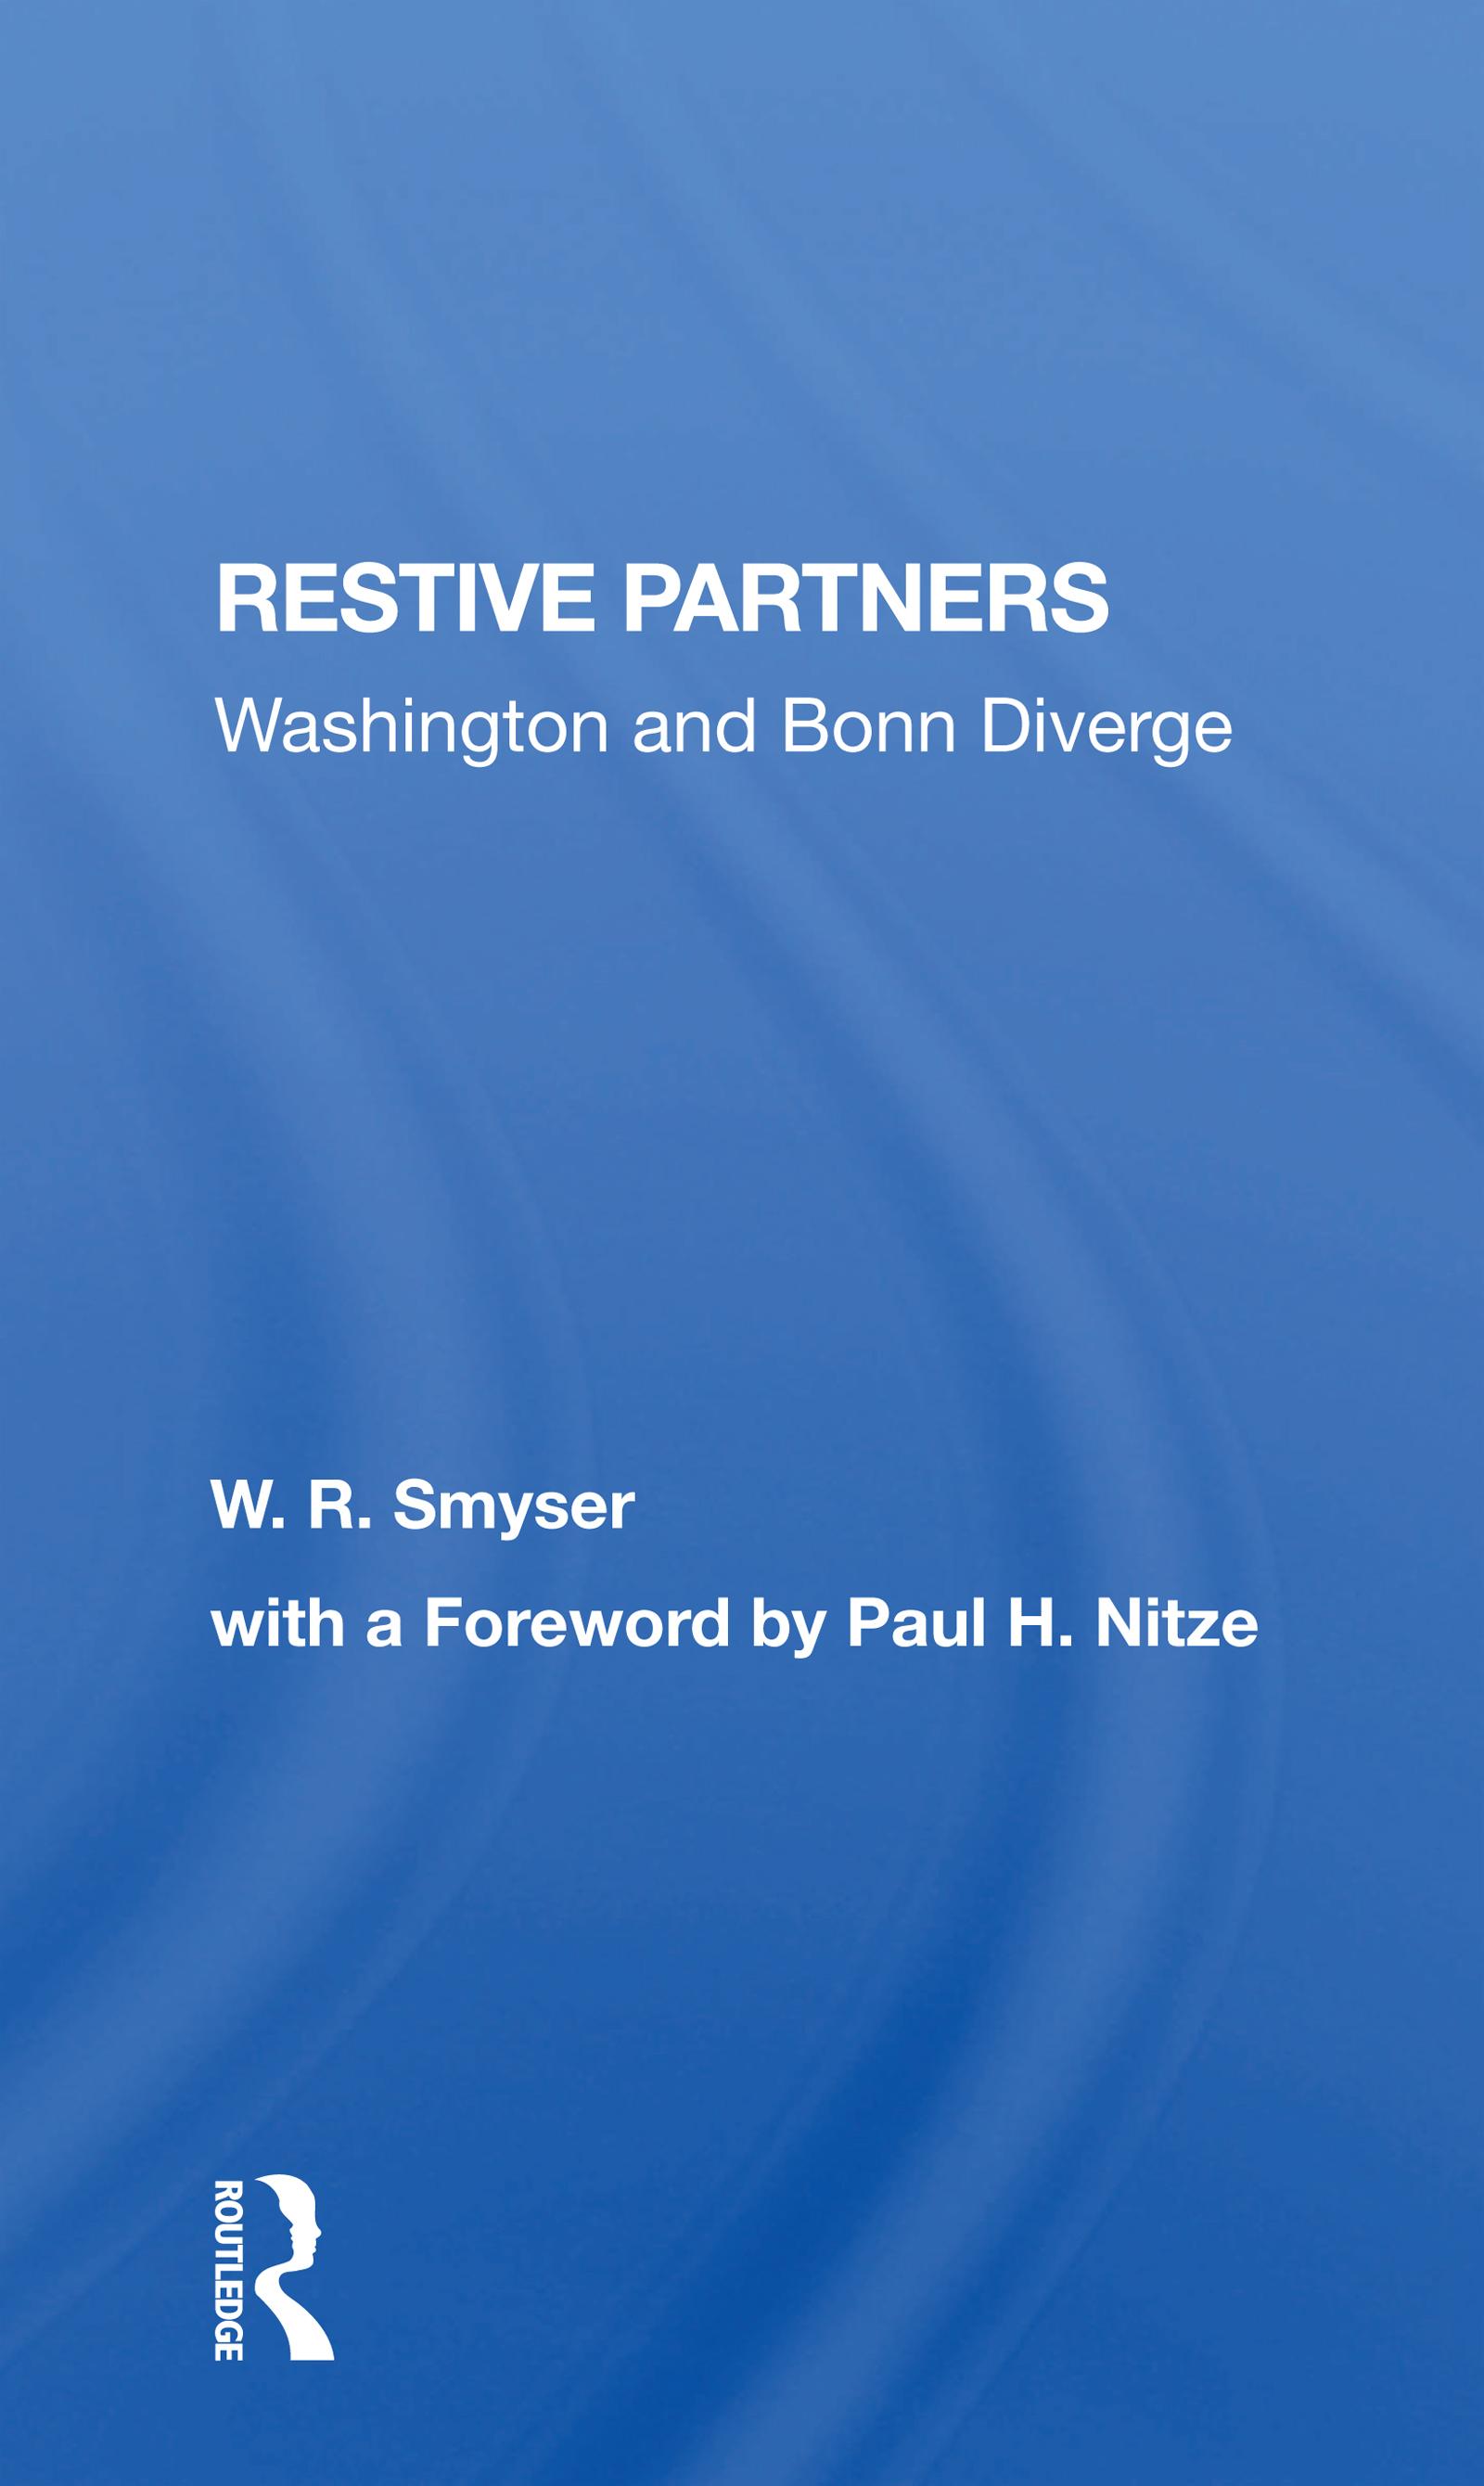 Restive Partners